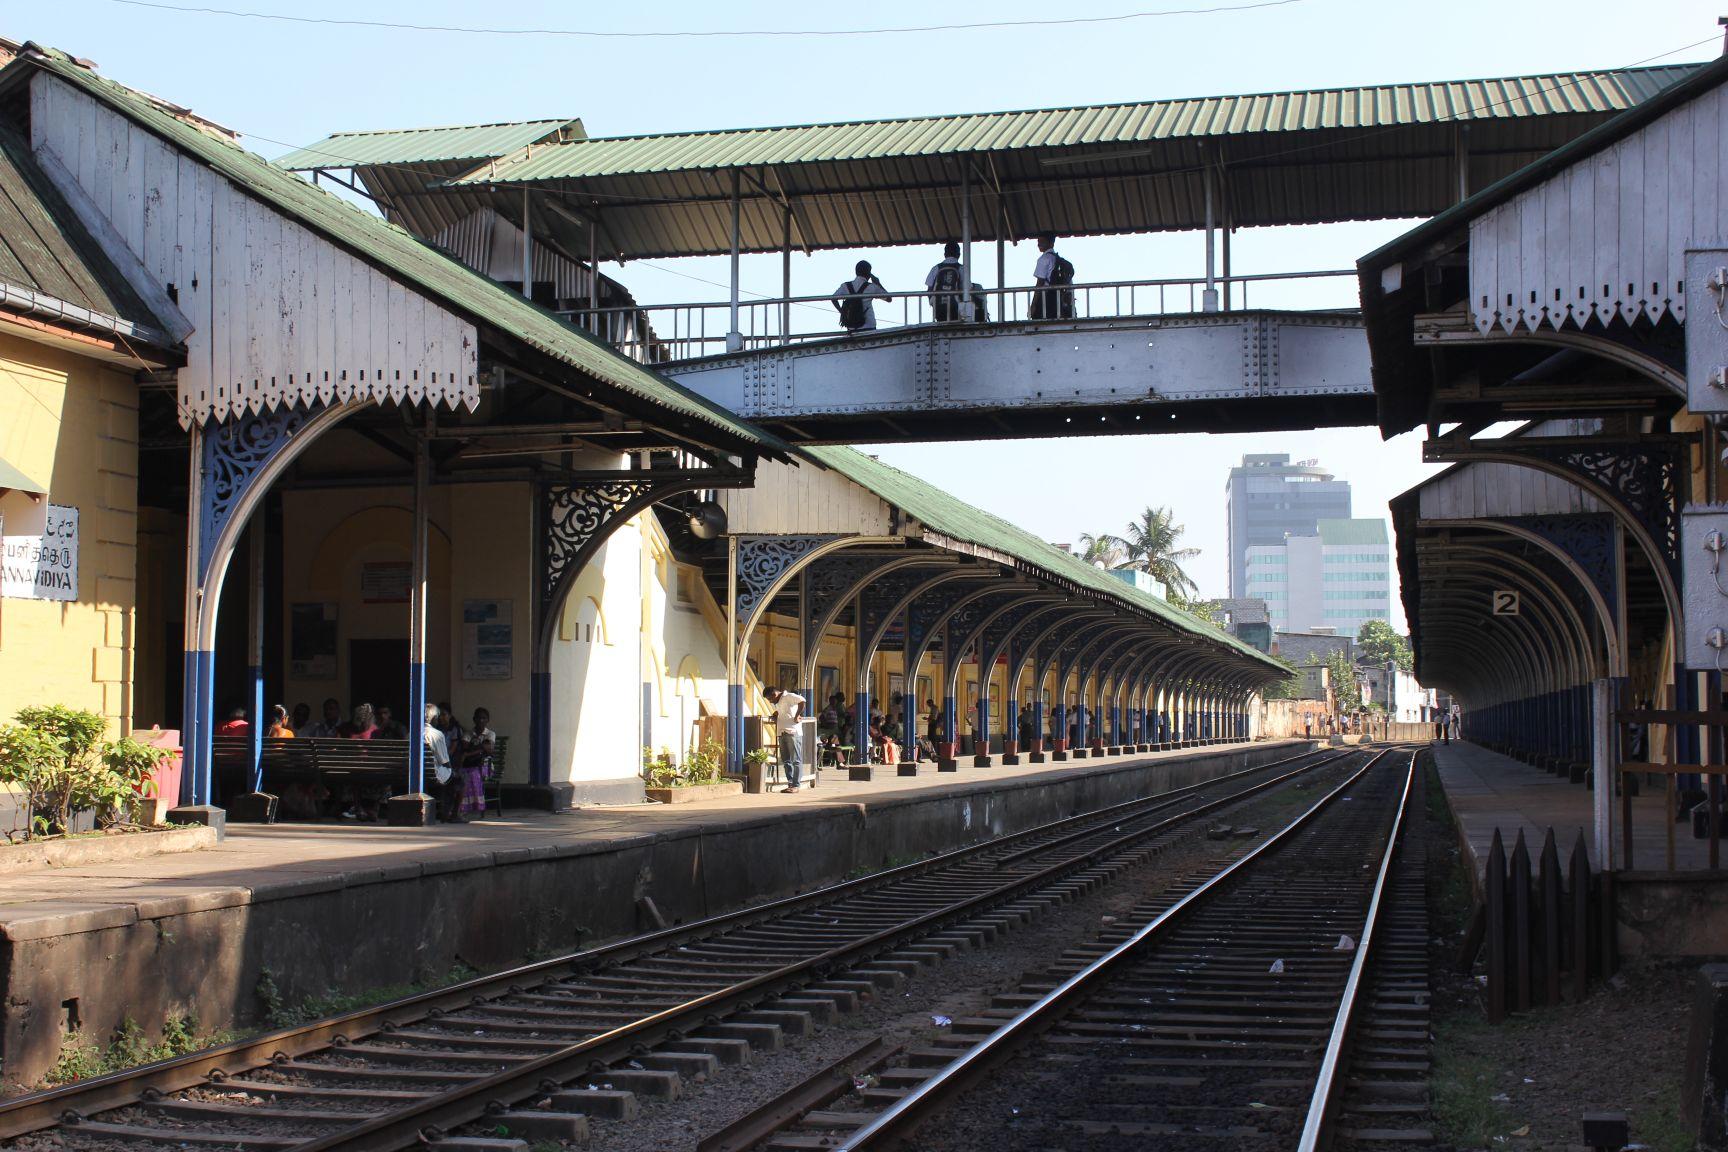 Zoznamka v meste Srí Lanka Colombo